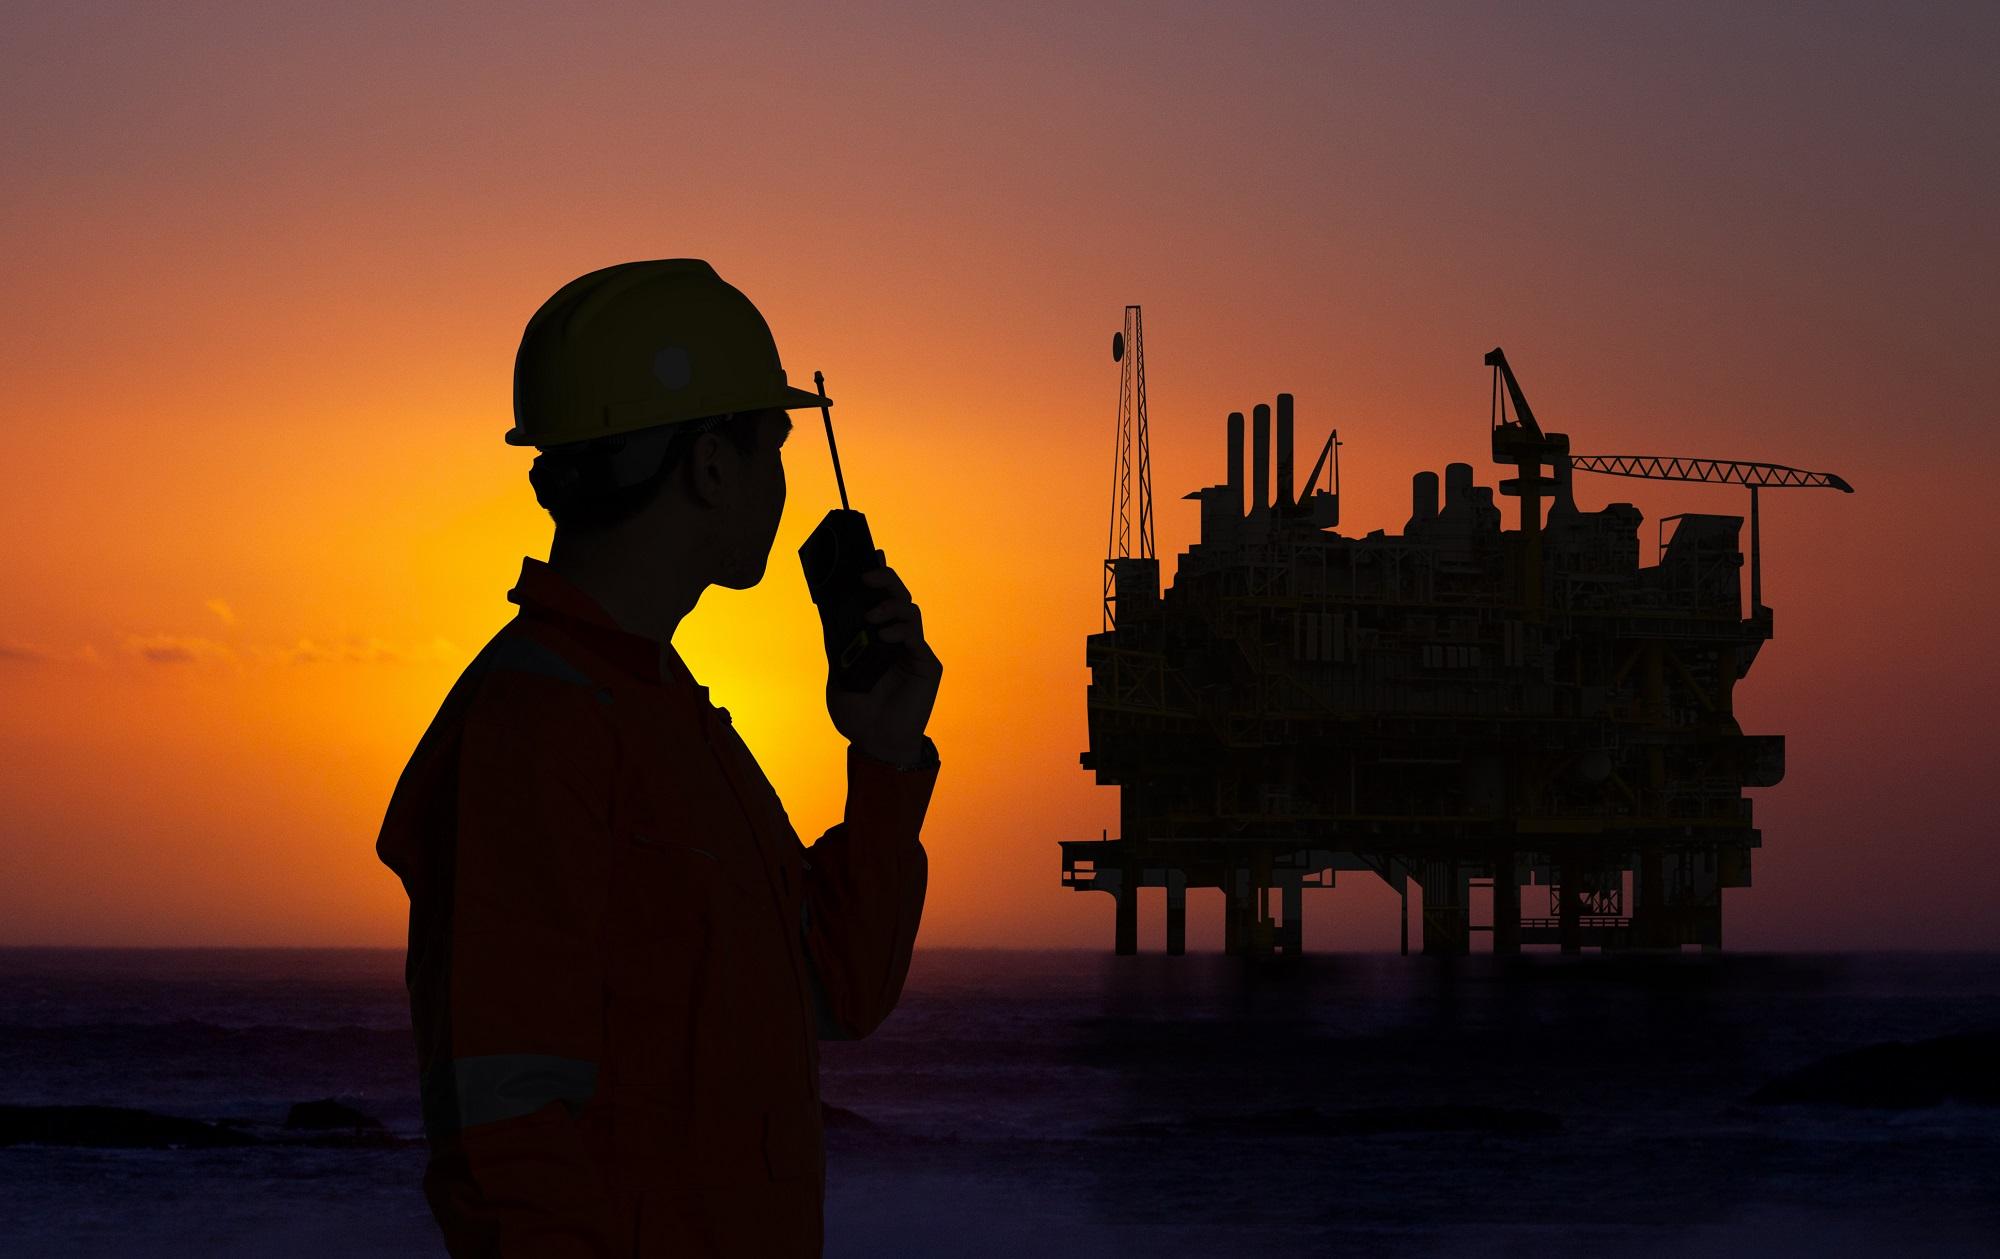 Marine Warranty Surveyor Services Worldwide - LOC